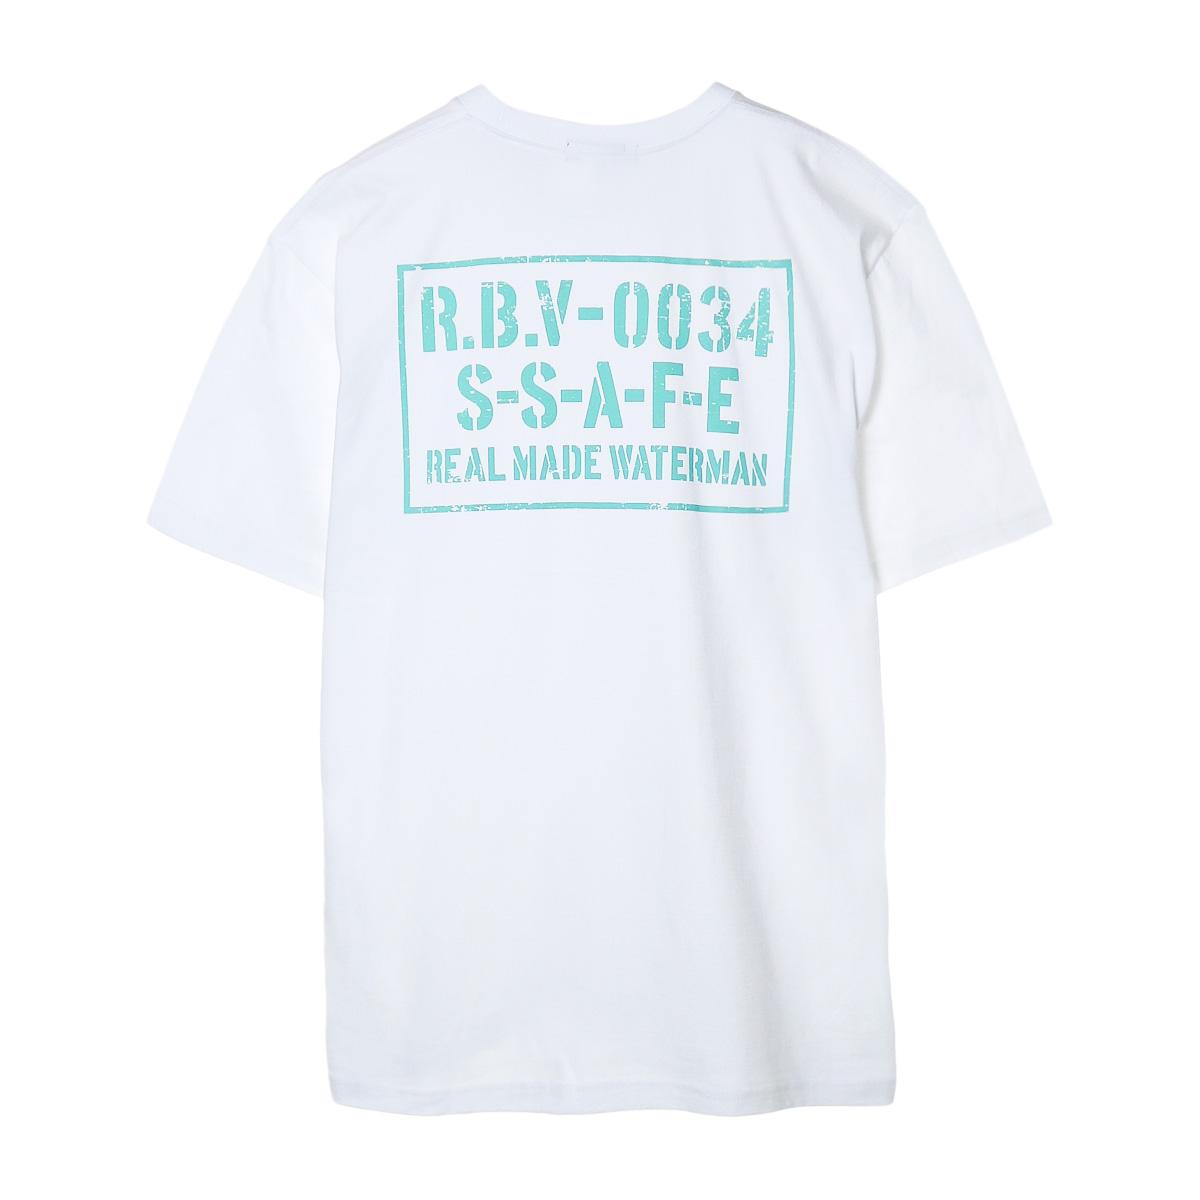 BOX LOGO S.S.A.F.E T-SHIRT BIG SIZE